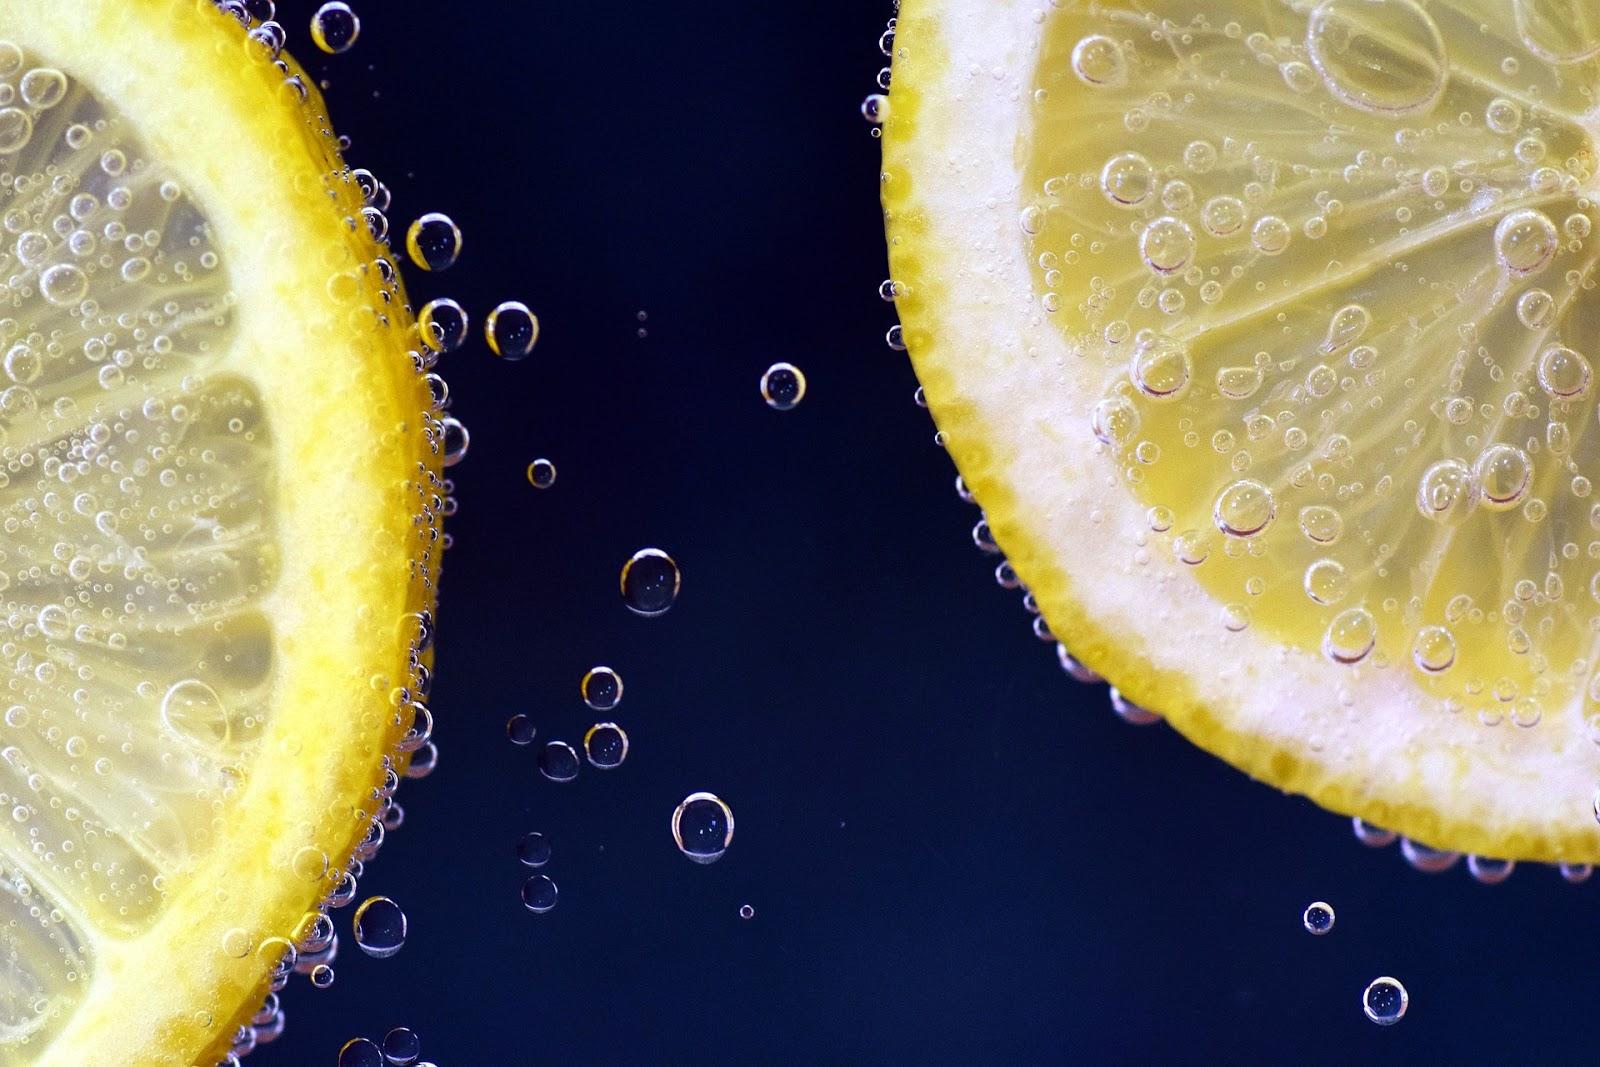 que beneficios tiene tomar agua tibia con jugo de limon